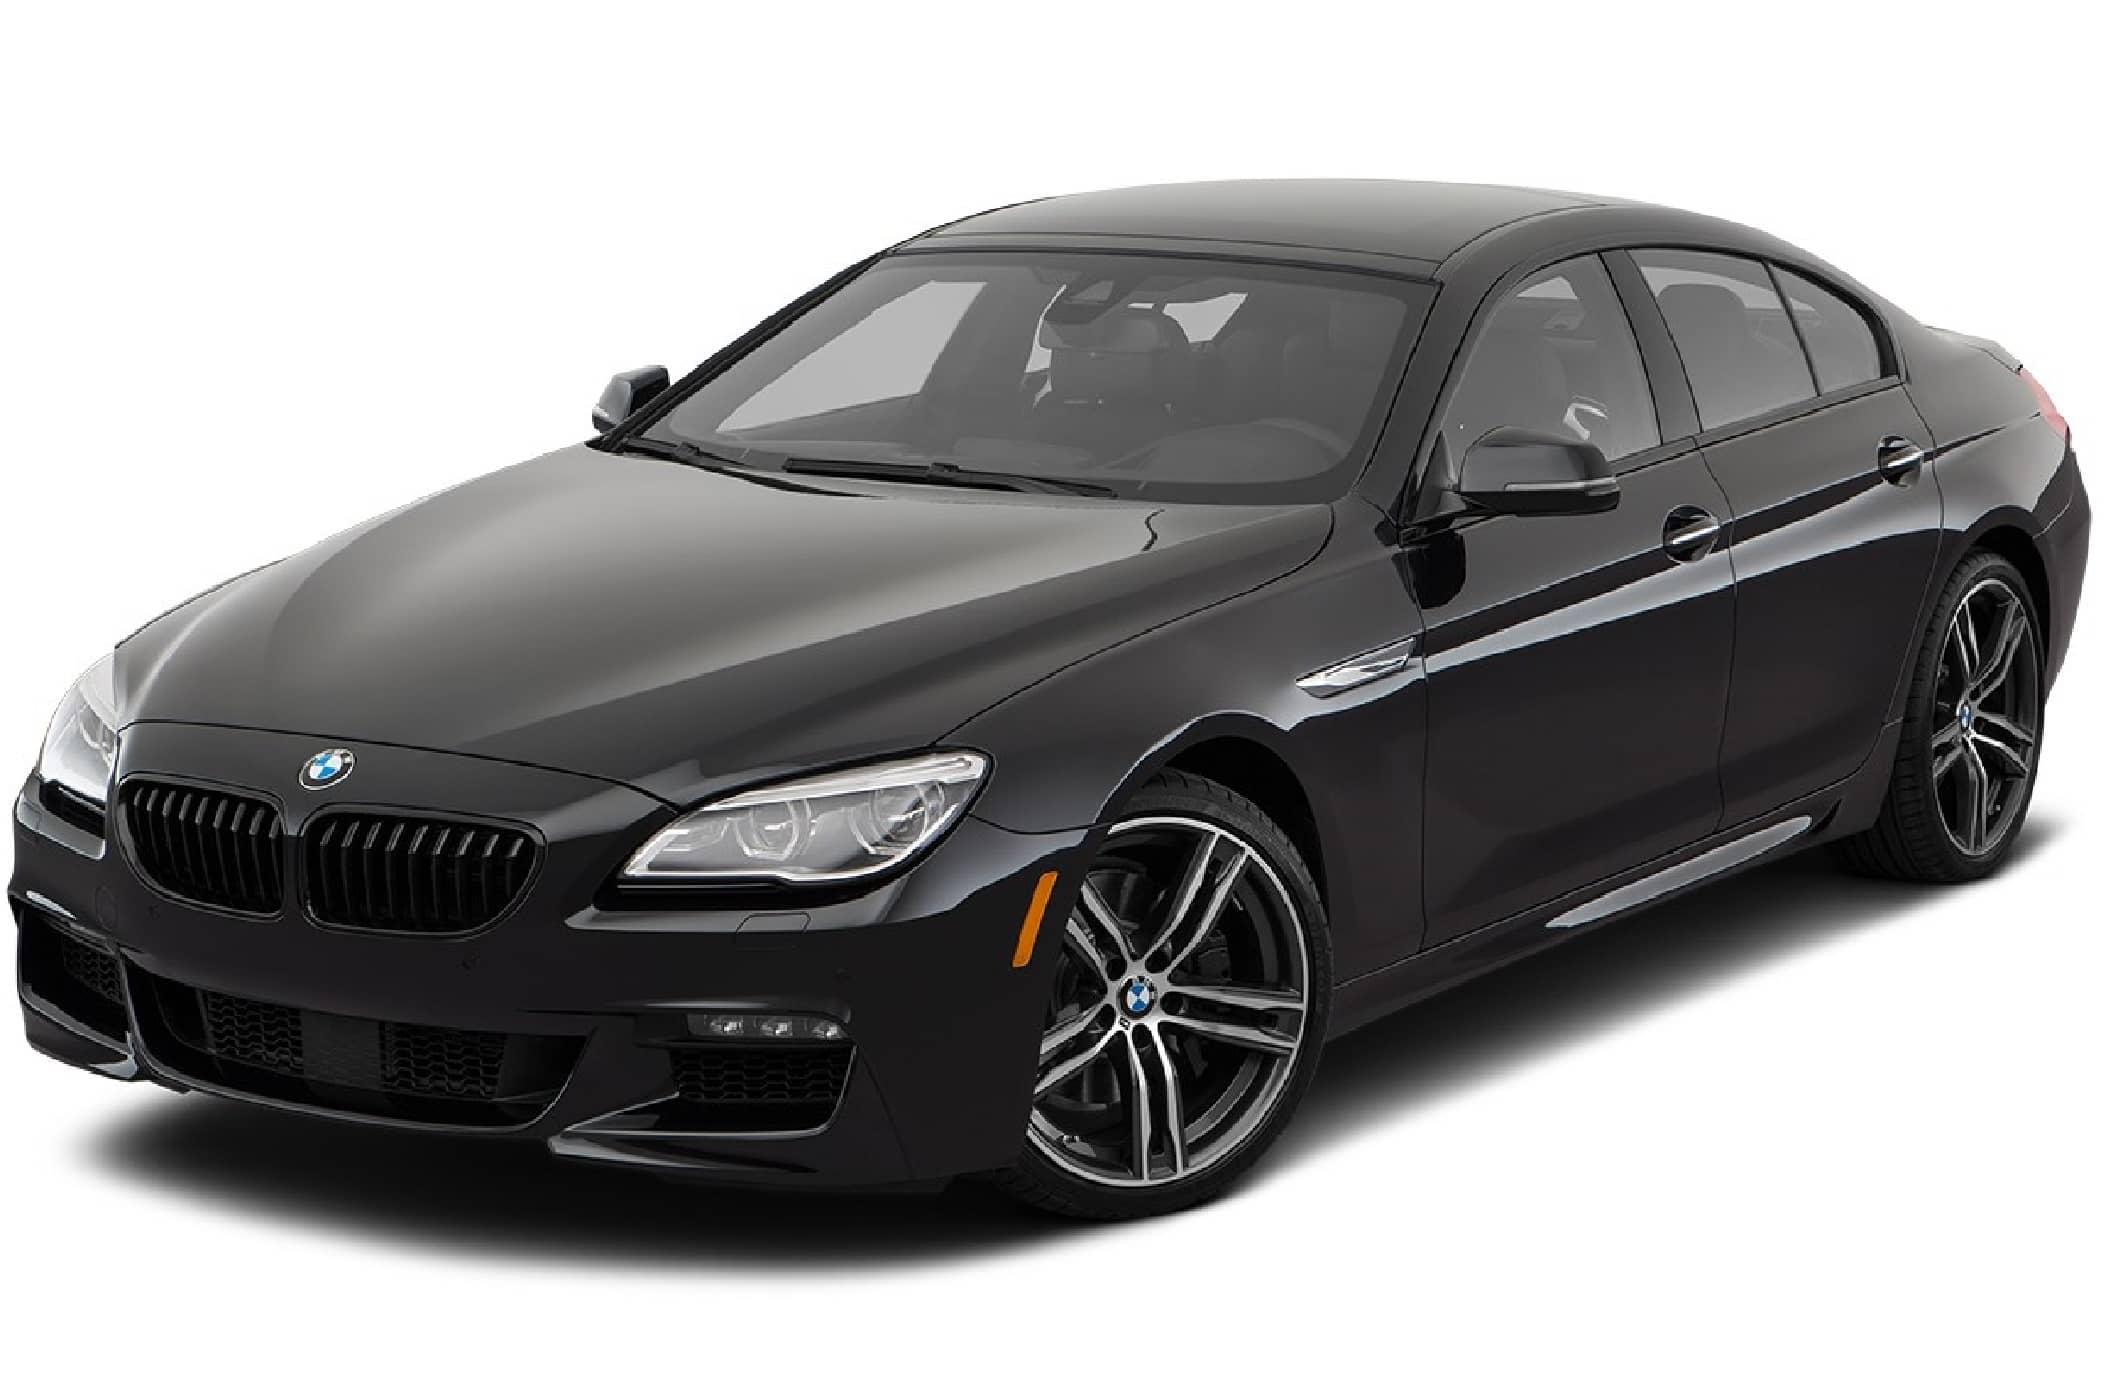 Сход-развал BMW серии 6